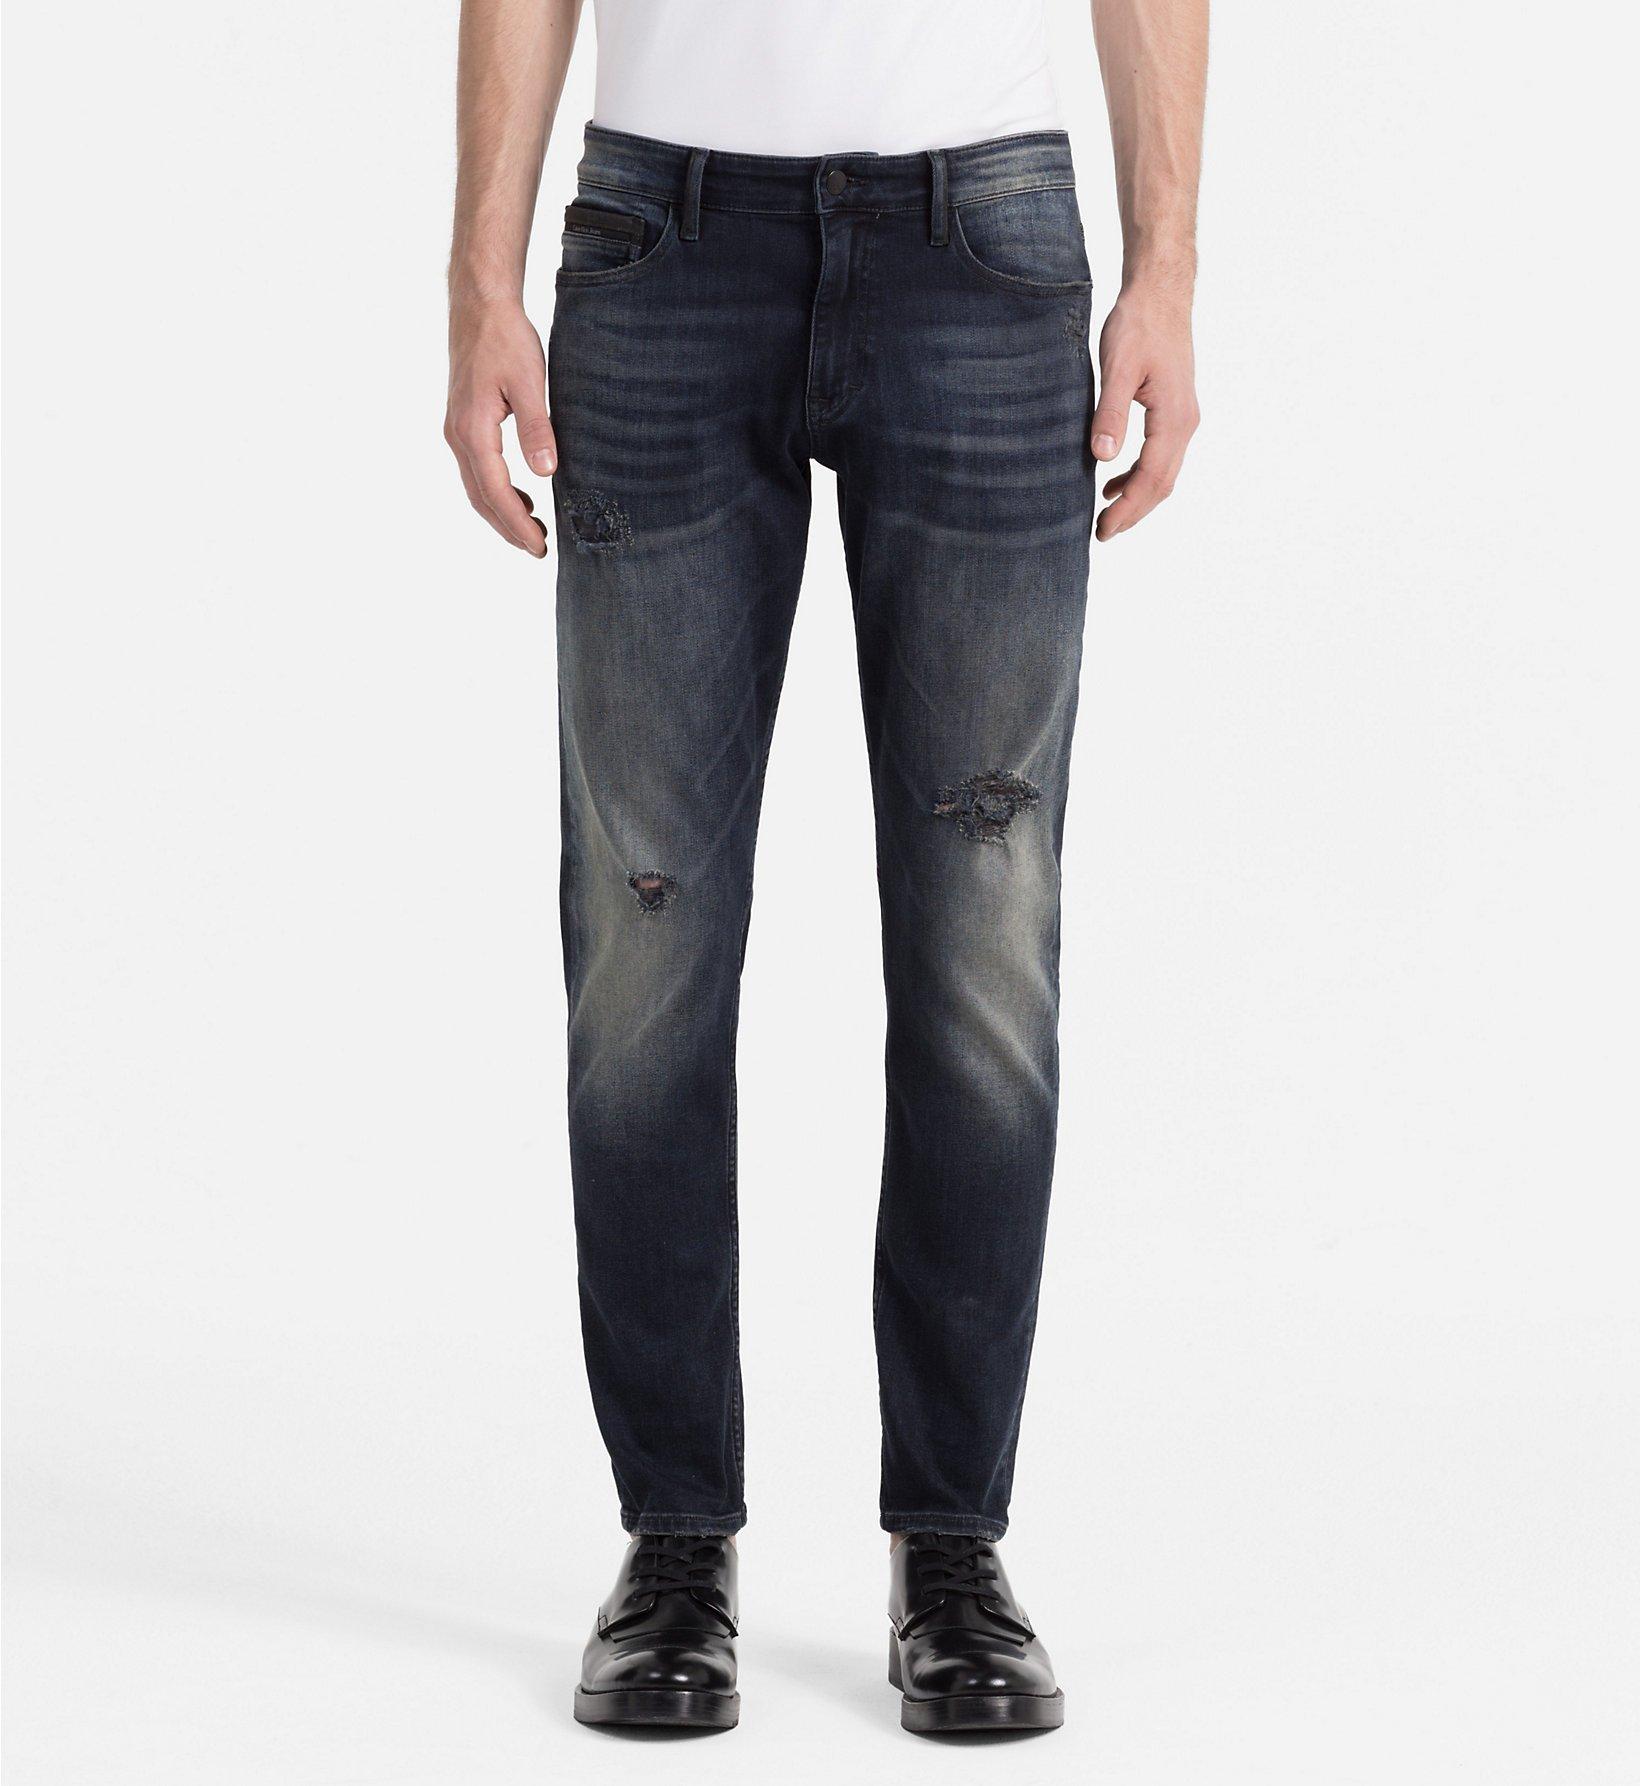 jeans CK